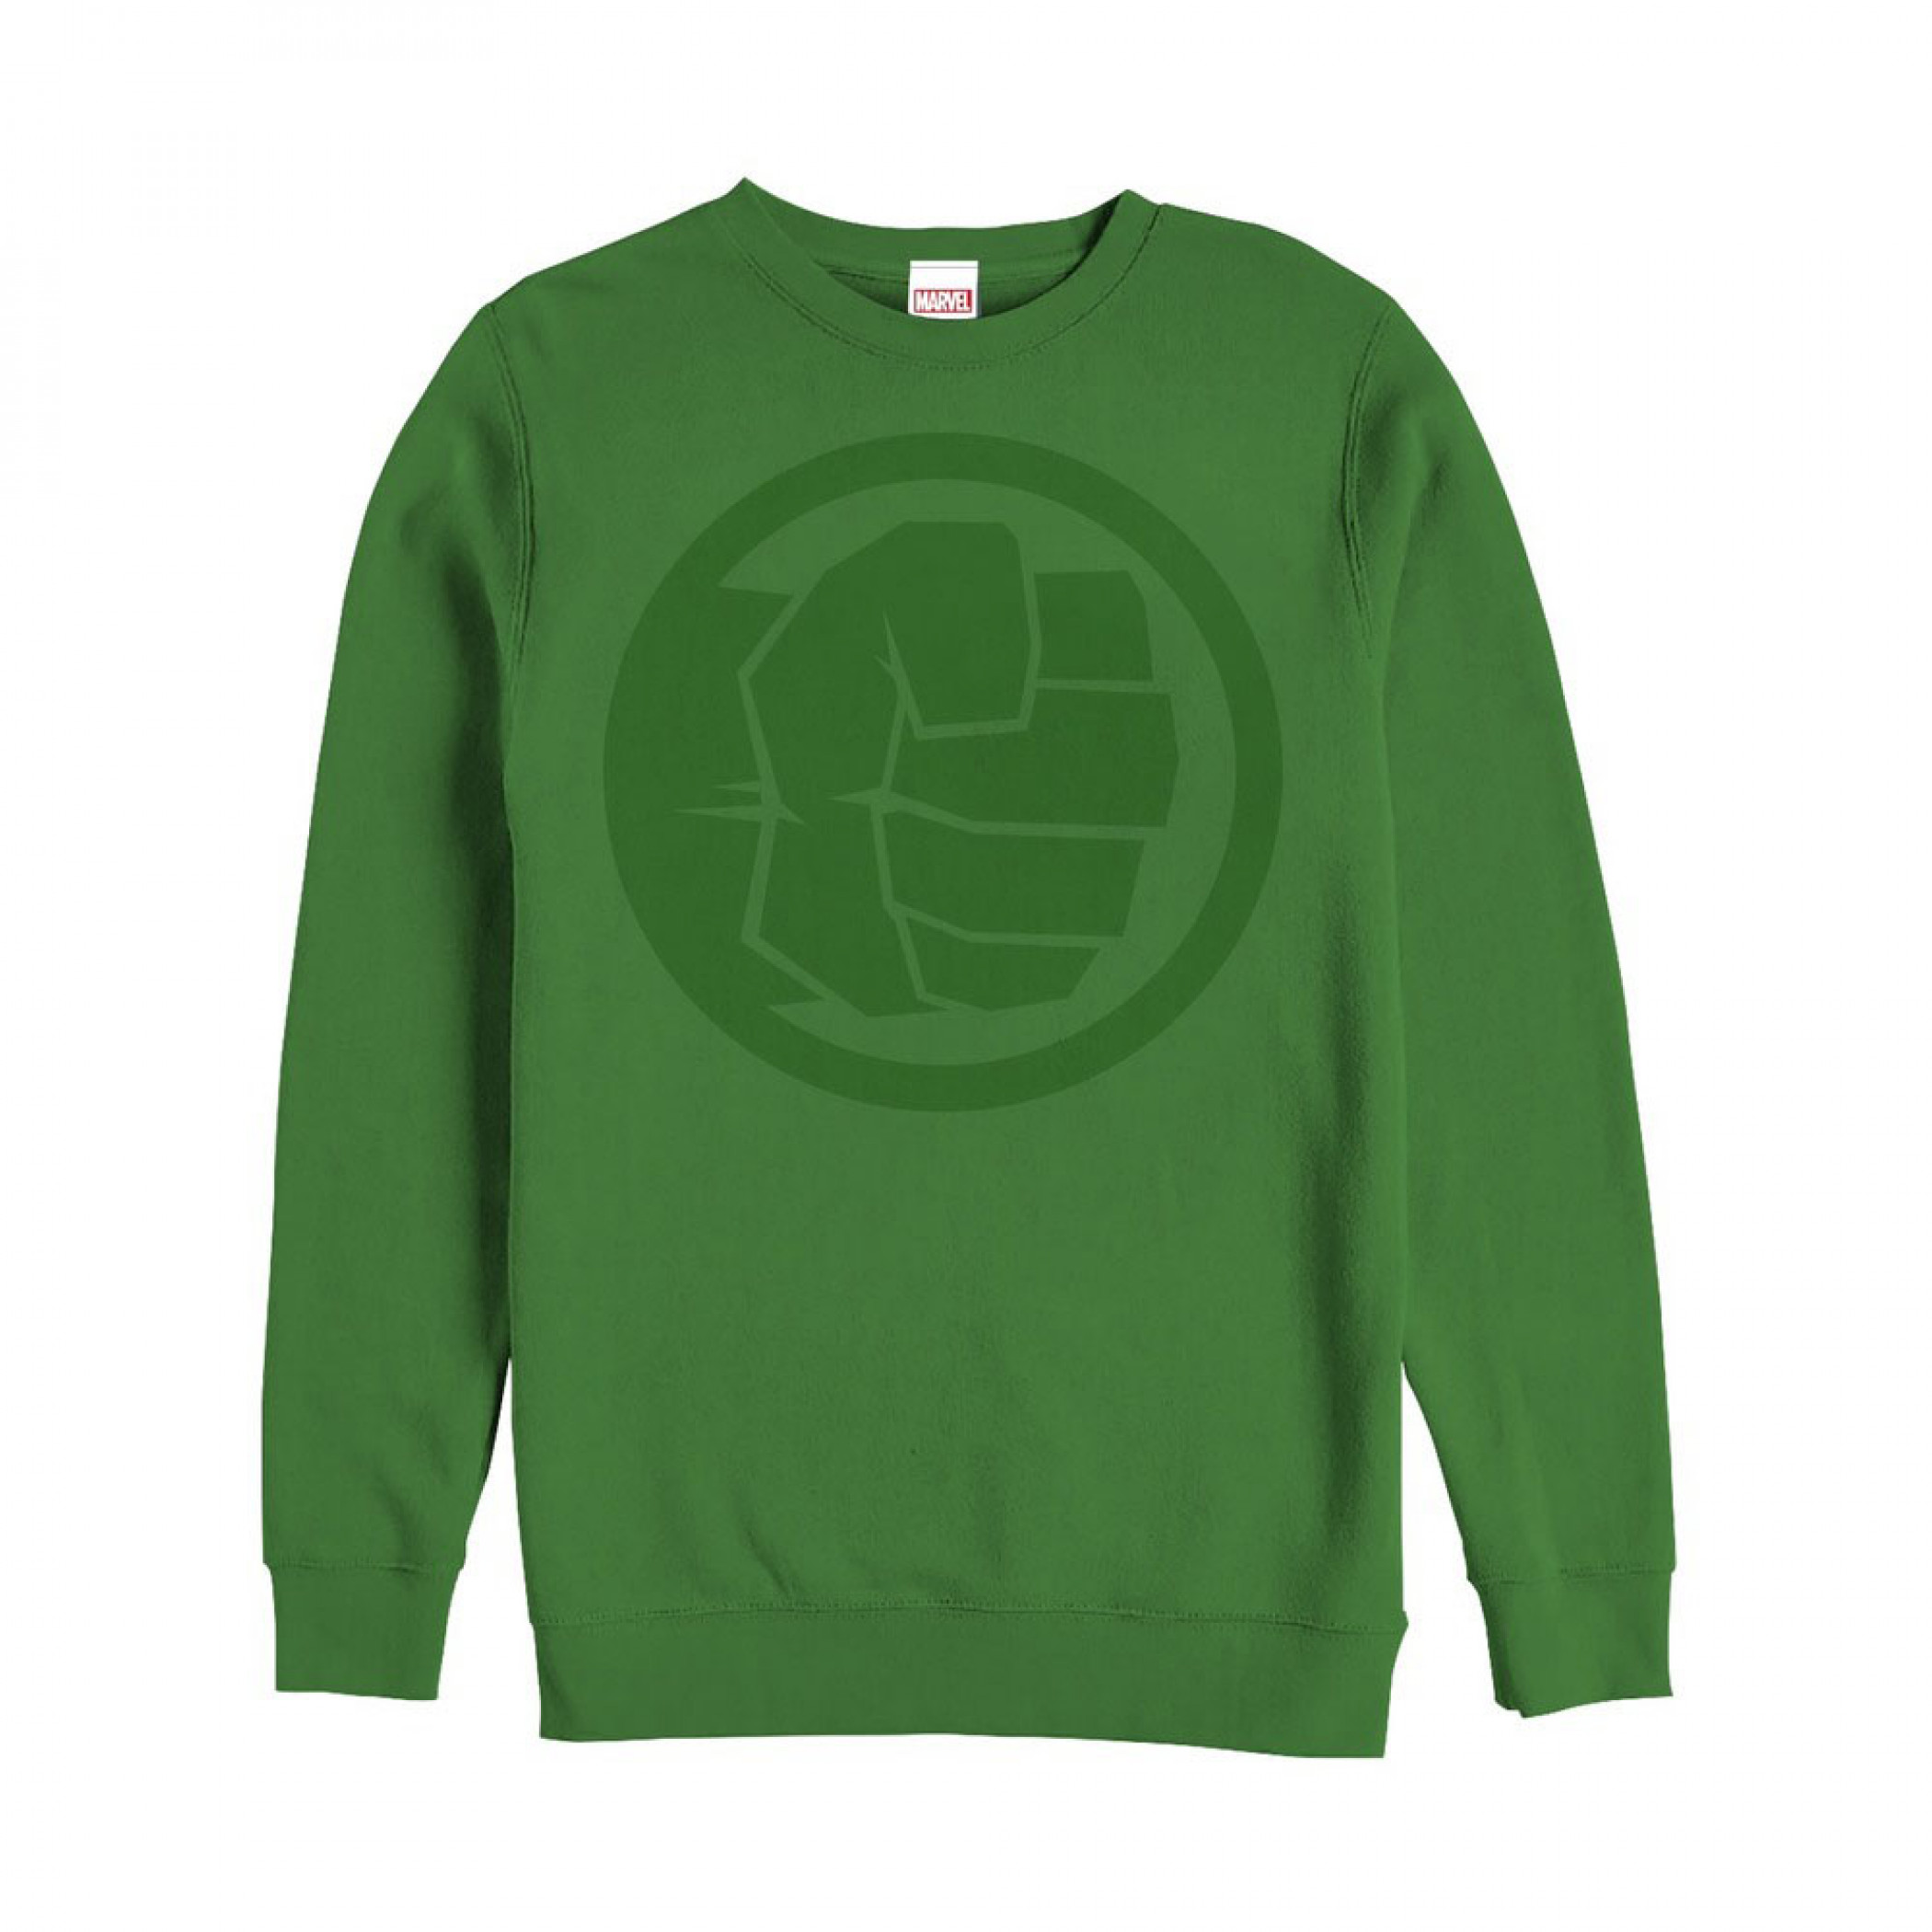 Hulk Fist Logo Green Sweatshirt